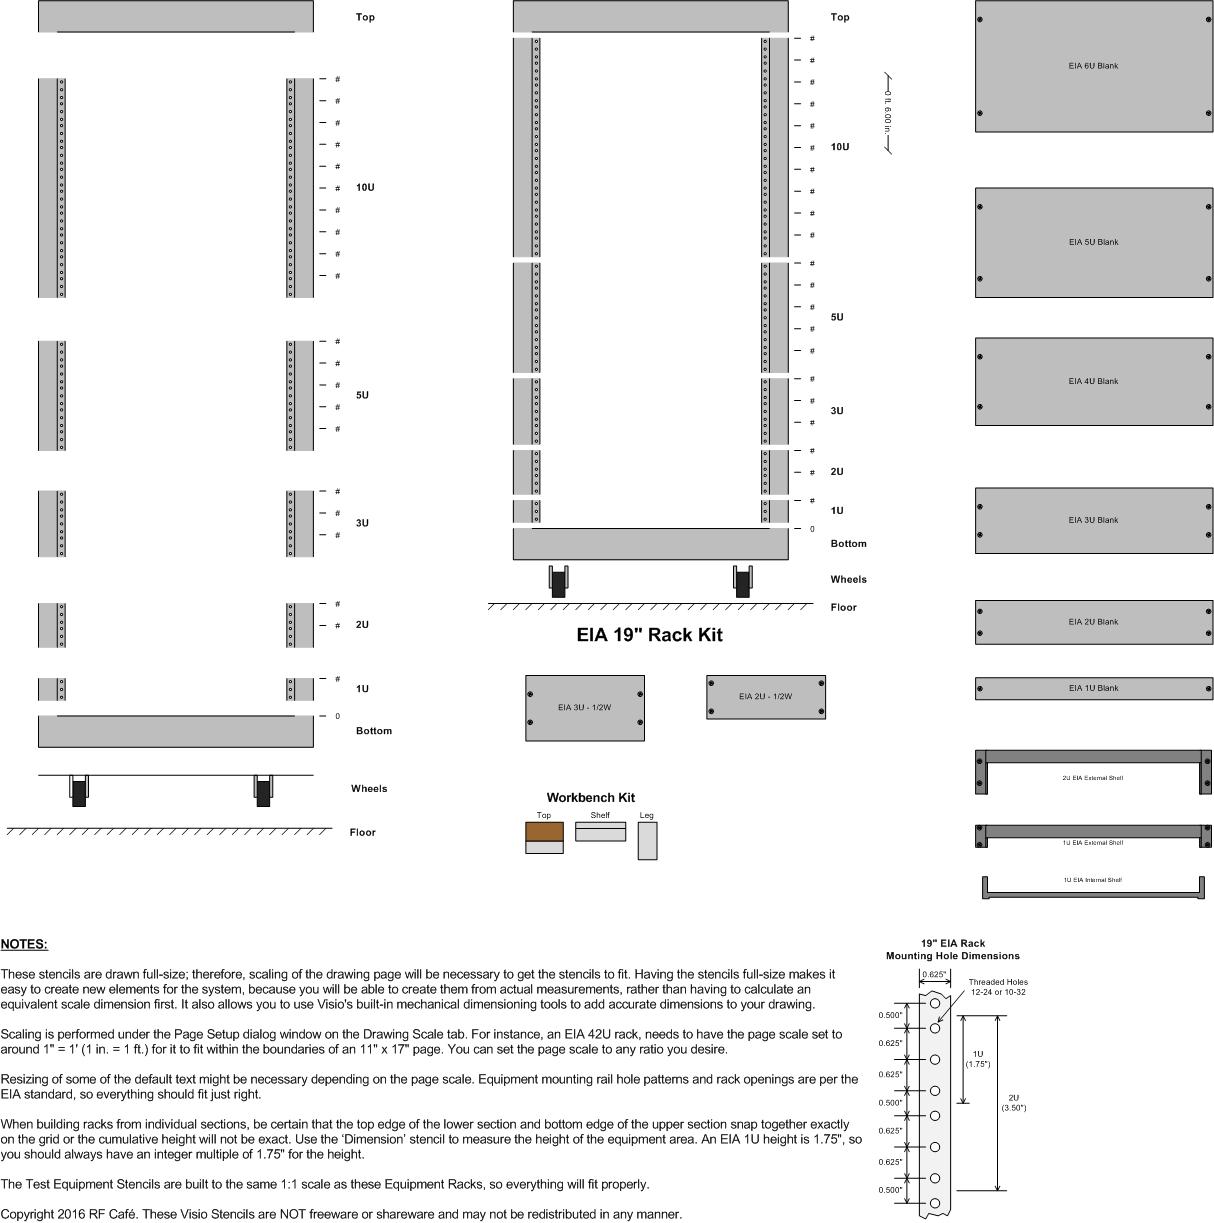 use case diagram visio 2010 shapes 2000 gmc yukon stereo wiring rf microwave wireless analog block diagrams stencils